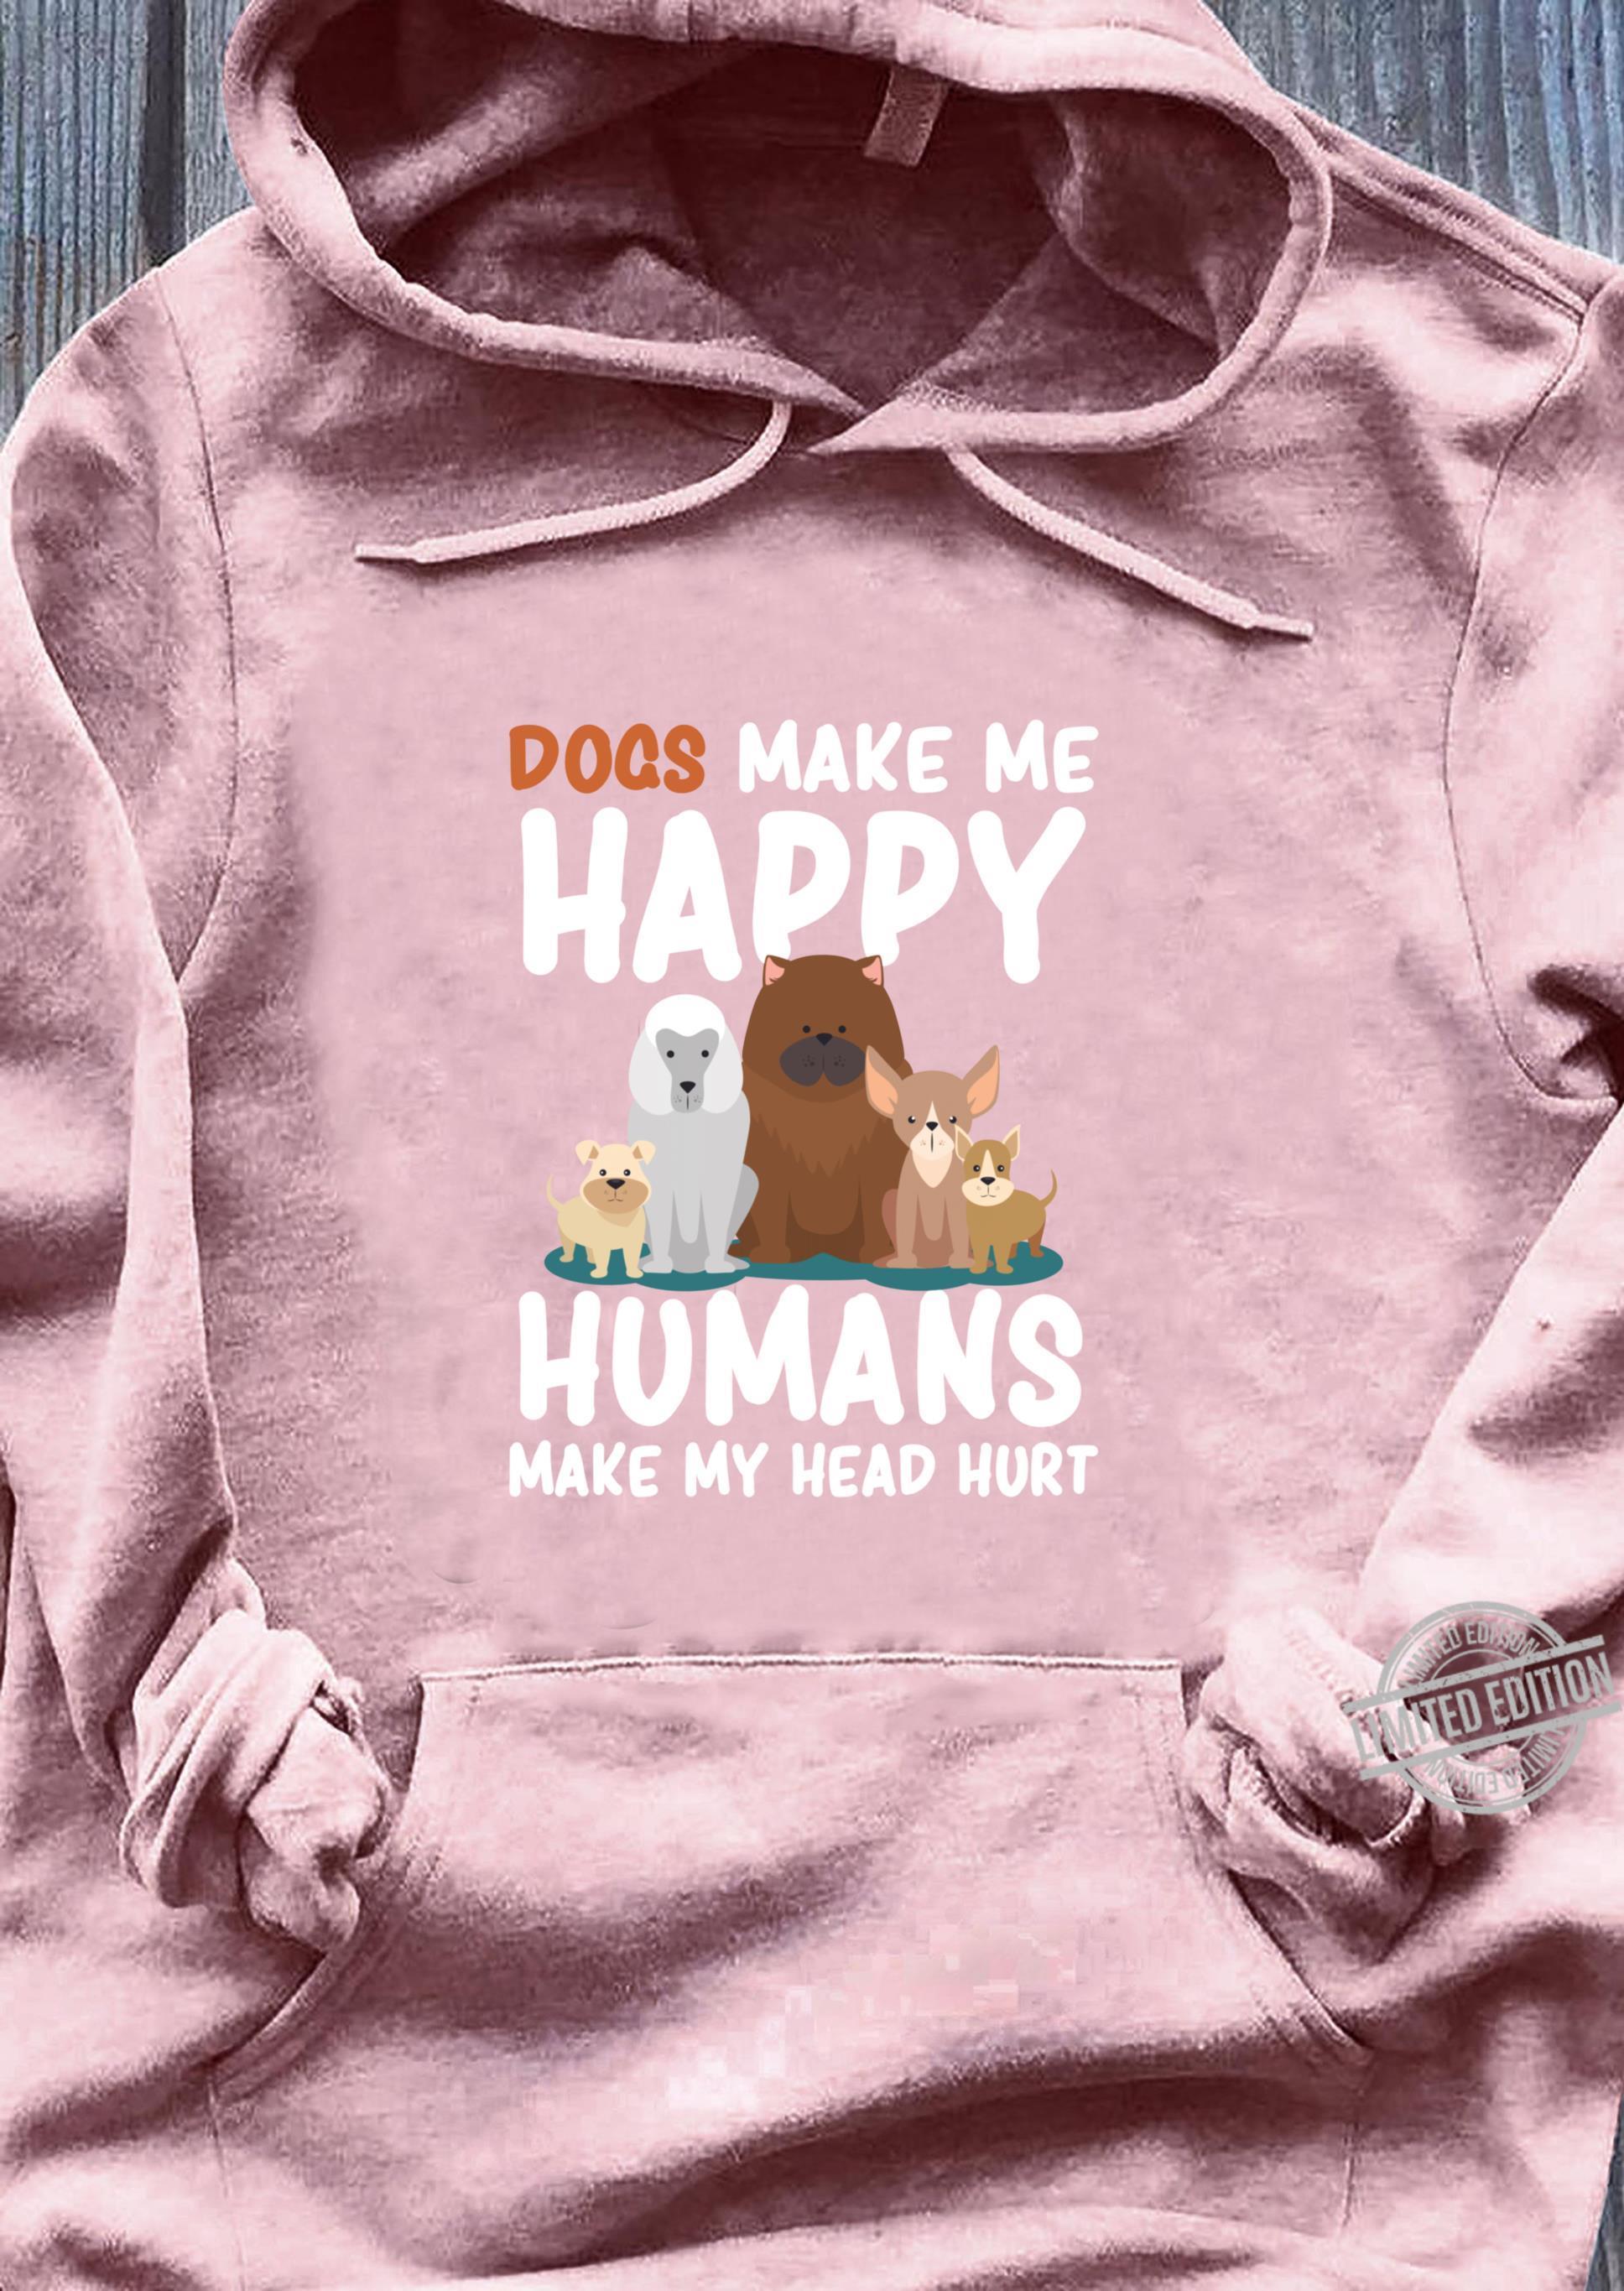 Dogs Dogs Make me Happy Humans Make my Head Hurt Shirt sweater